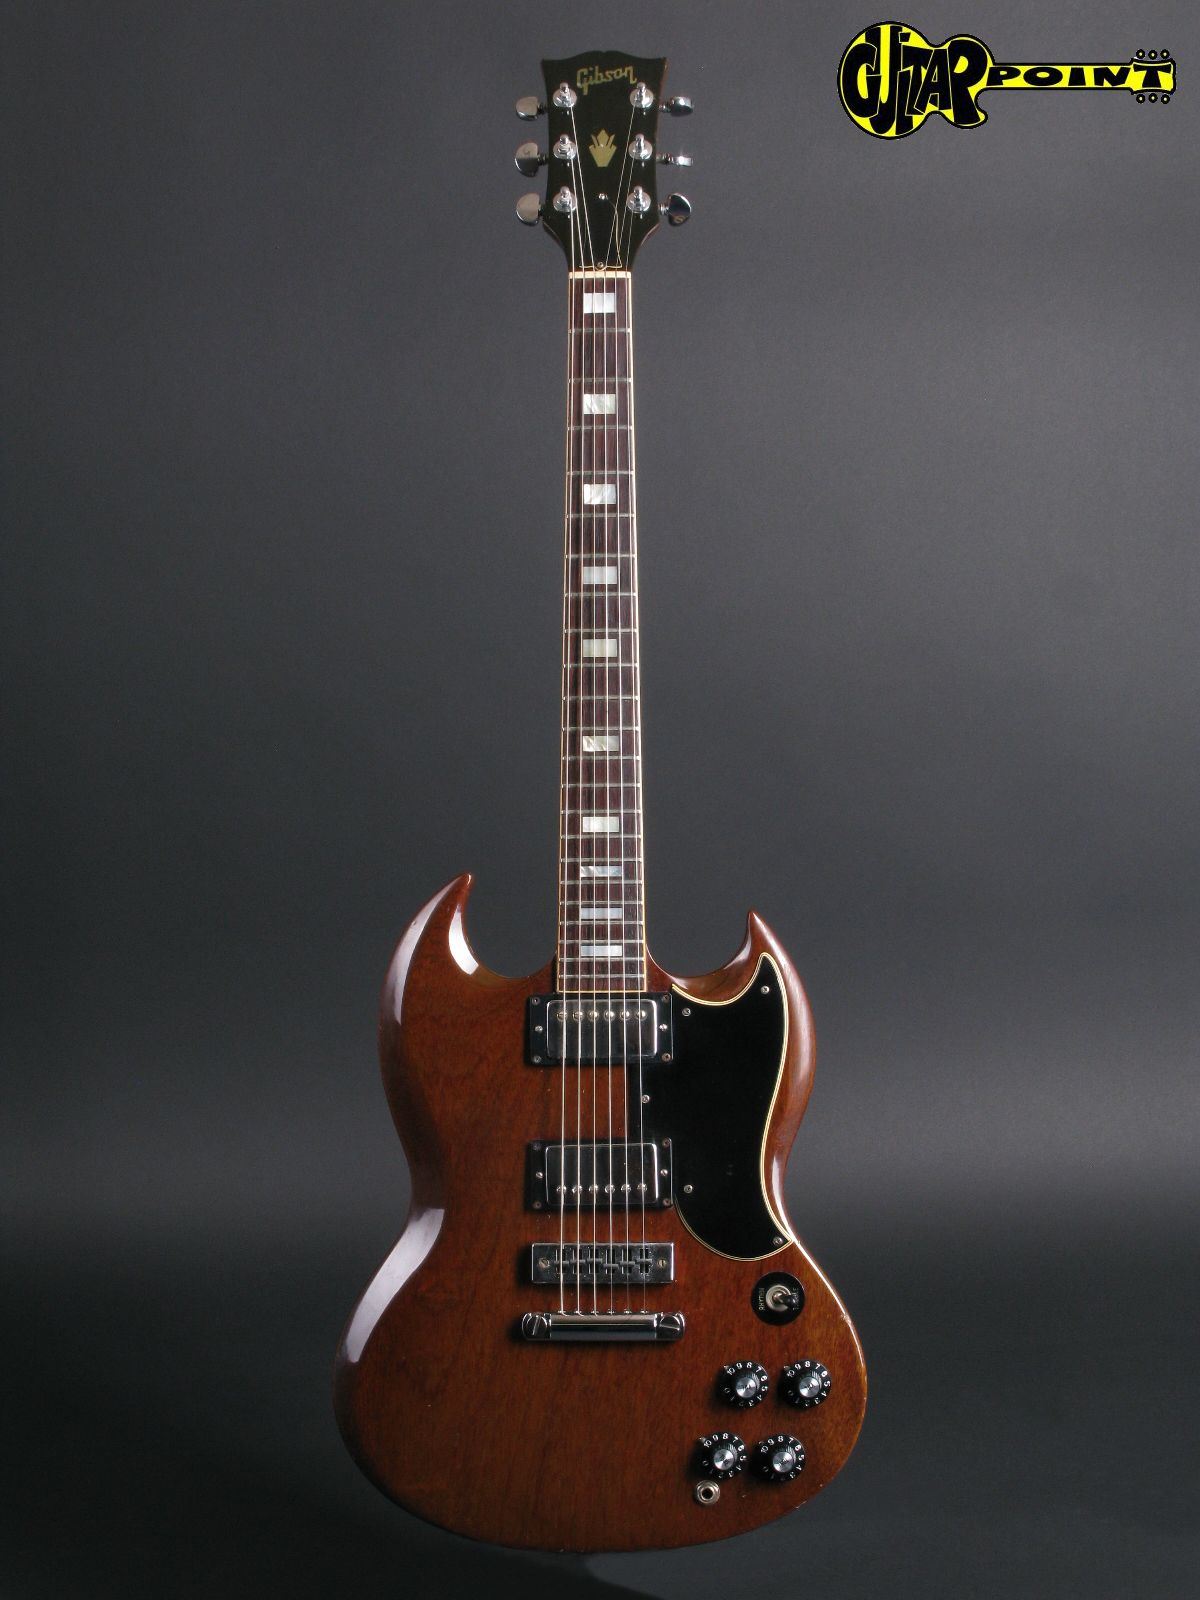 Gibson SG Standard 1972 Cherry Guitar For Sale GuitarPoint